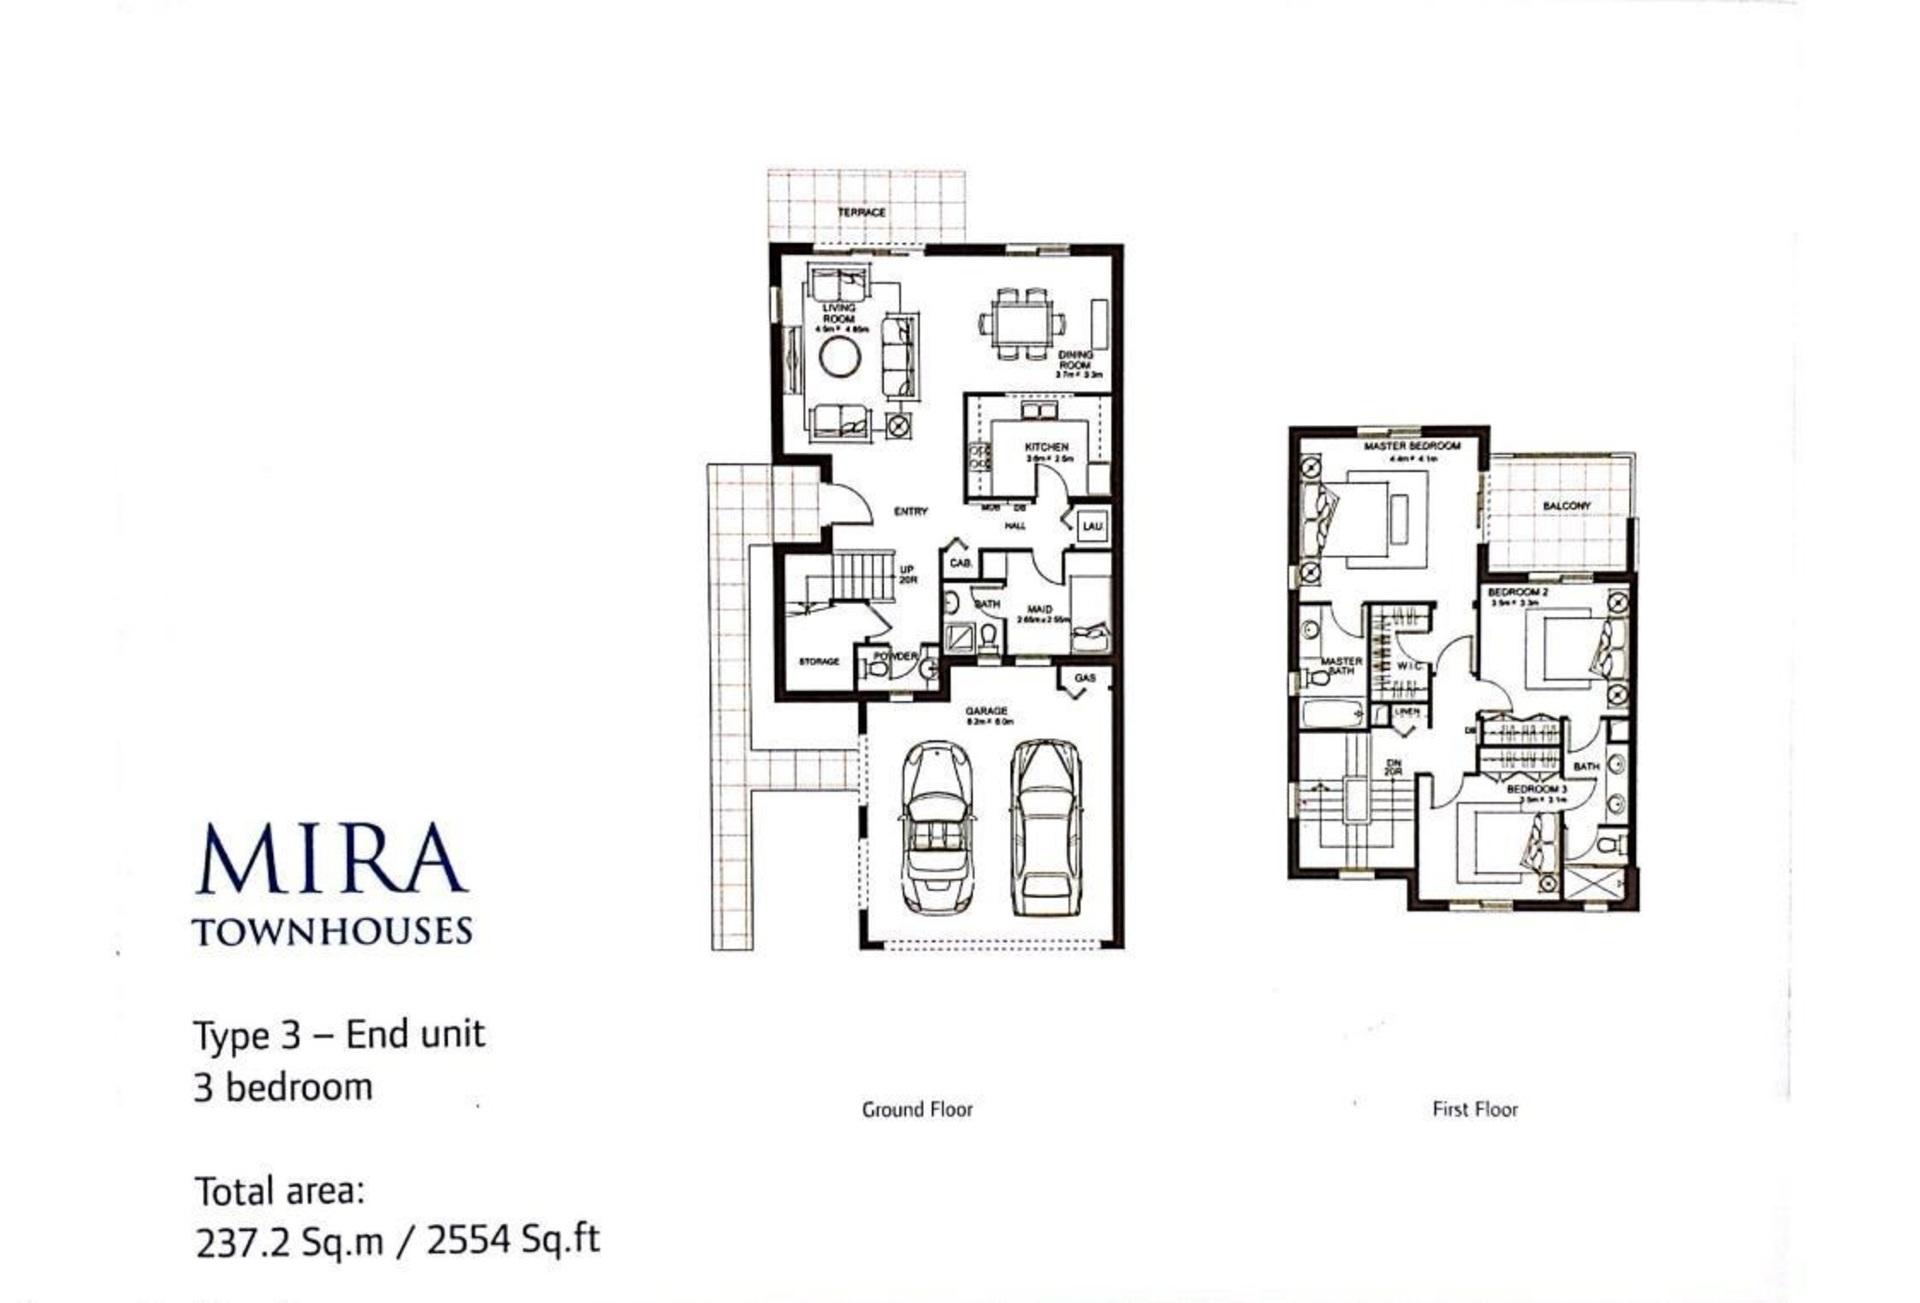 PHASE 4 – TYPE 3E @ MIRA, Single Row 3BR + Maid's + Big Storage Room